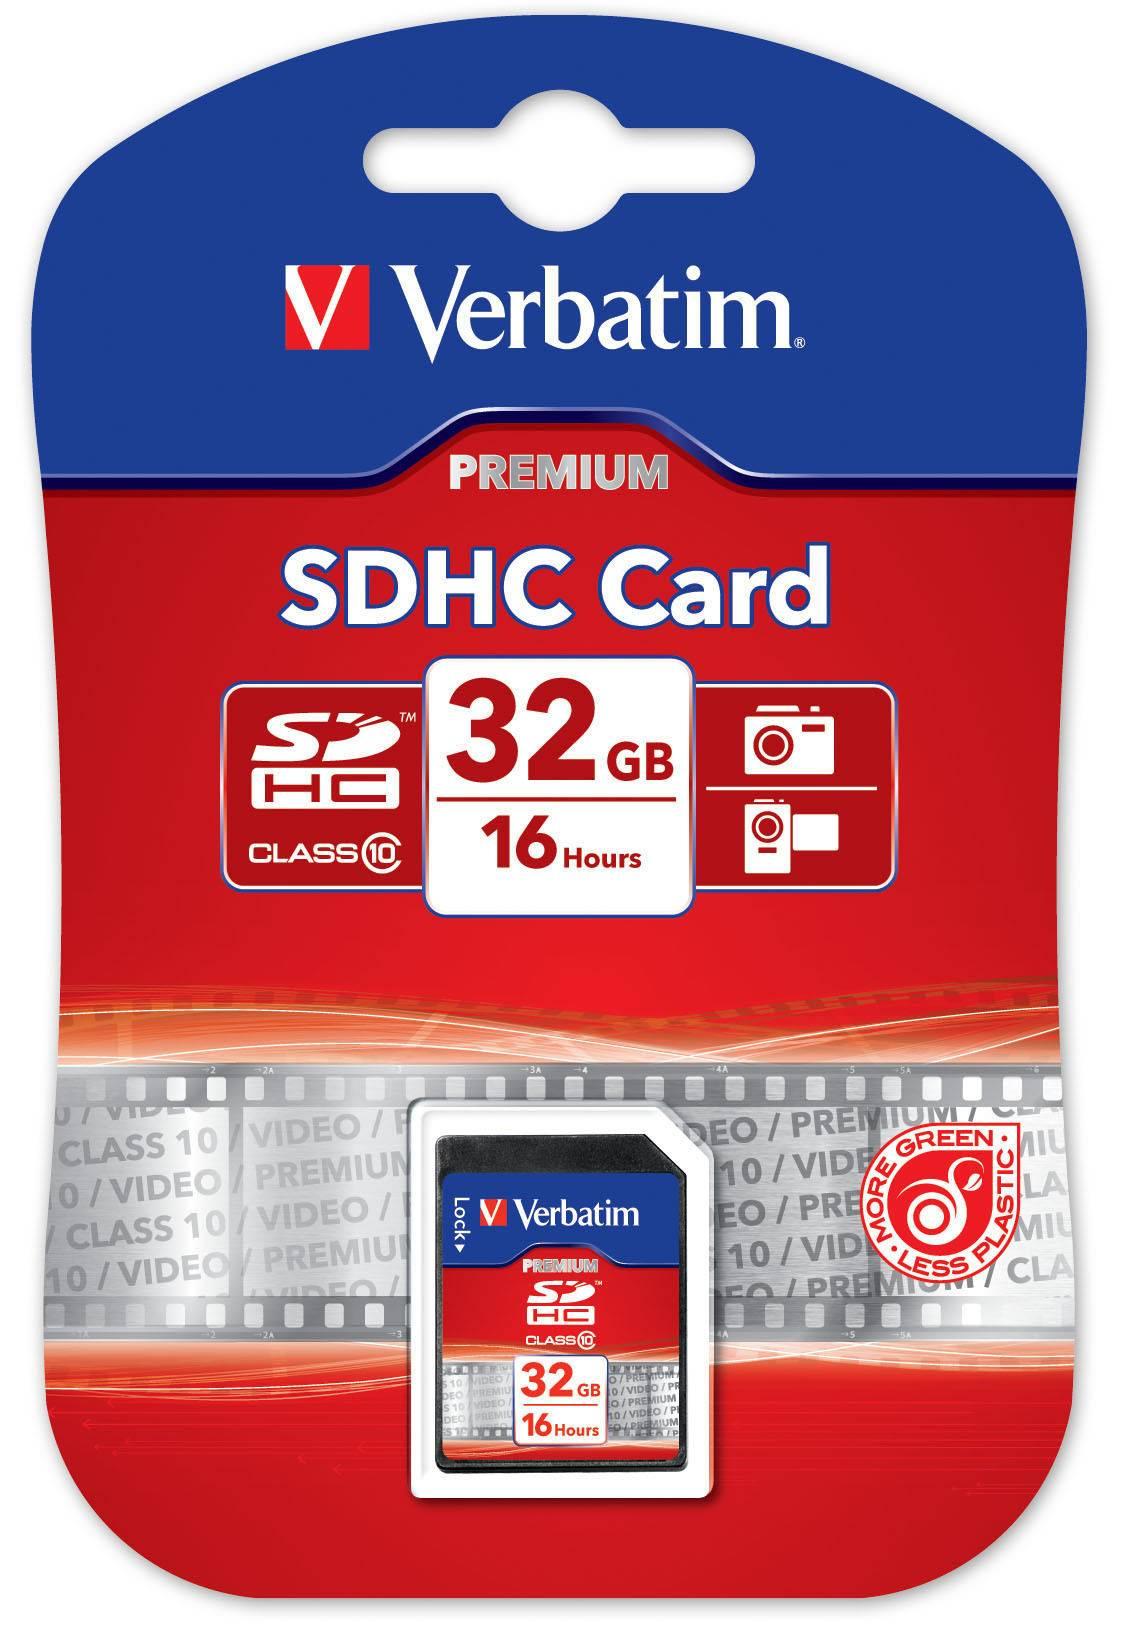 Verbatim minneskort, SDHC Class 10, 32GB